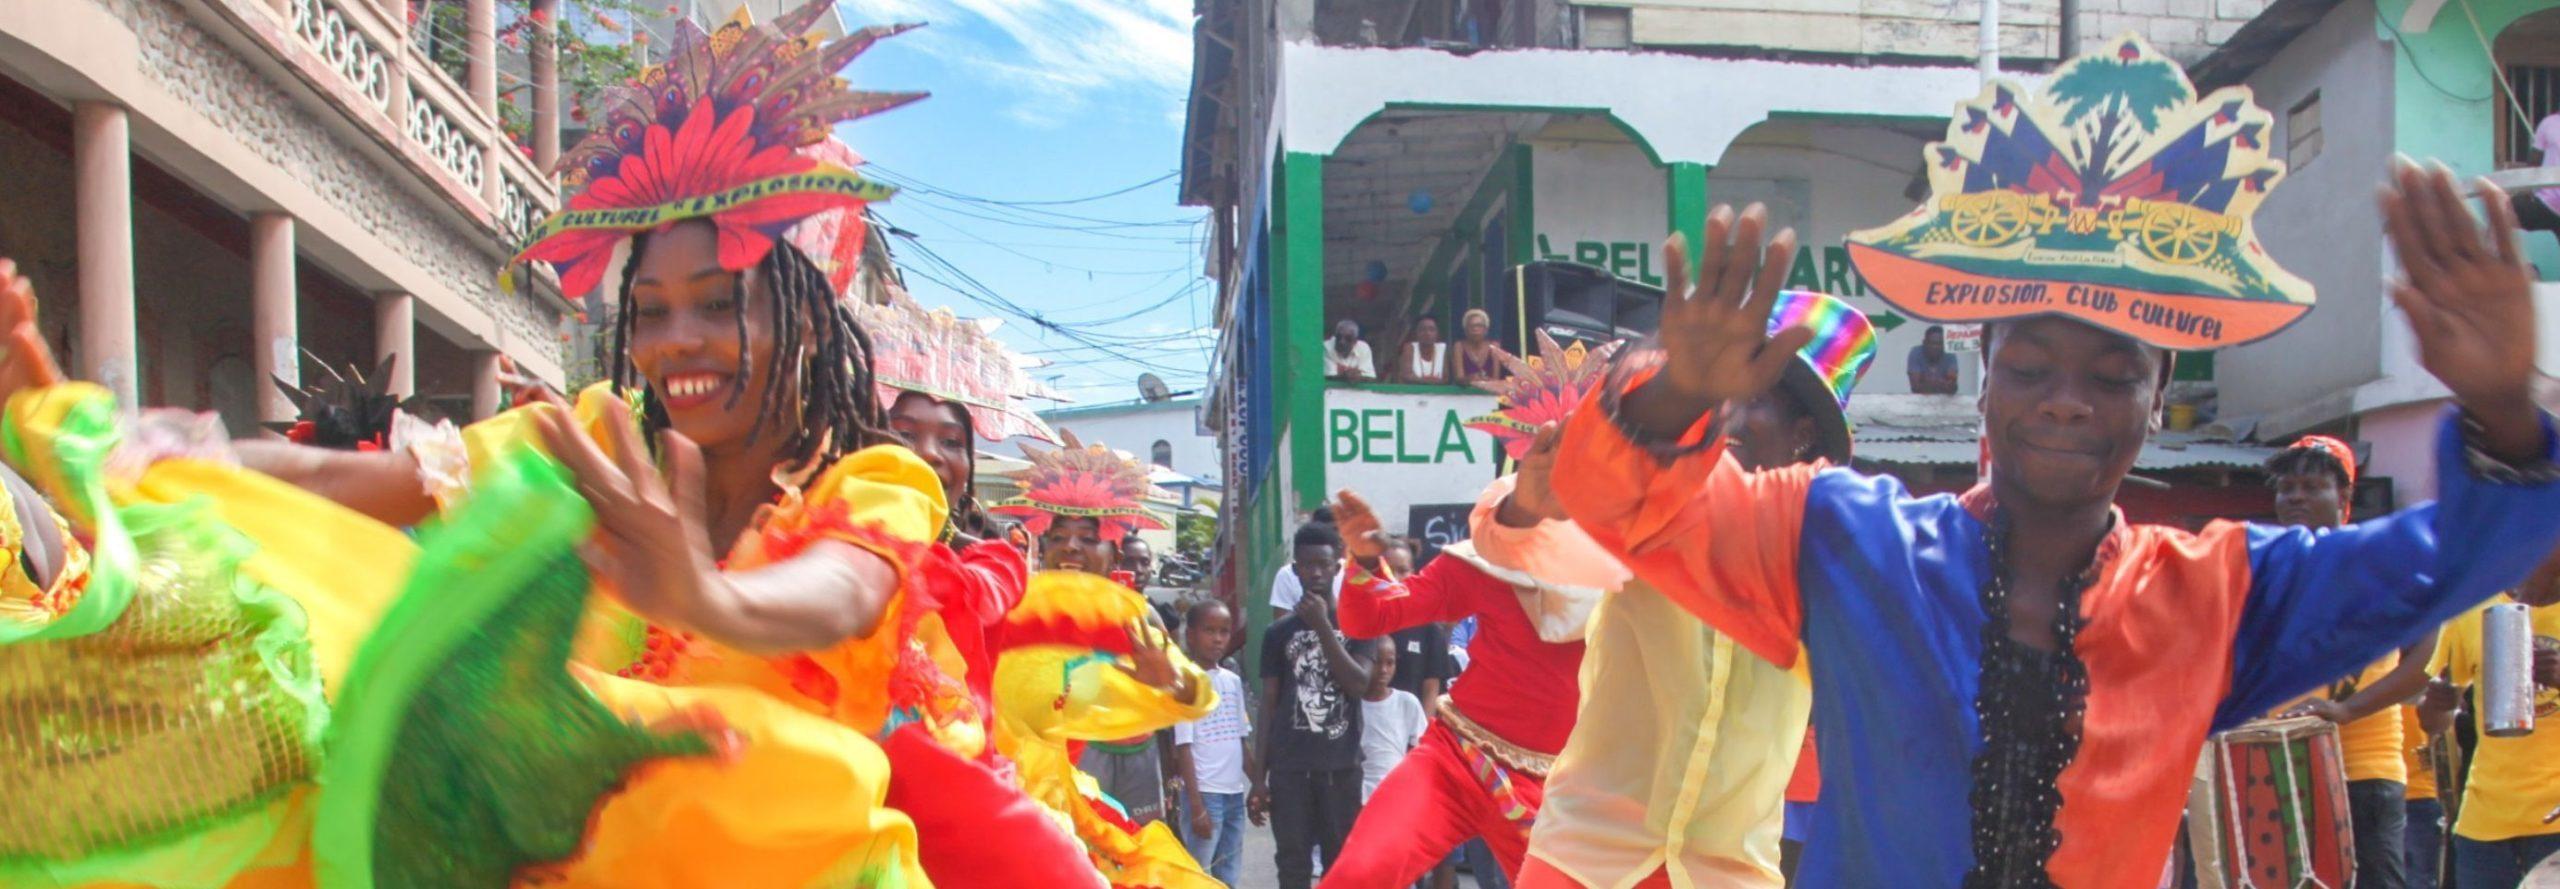 Haïti : Un carnaval sur fond de crise